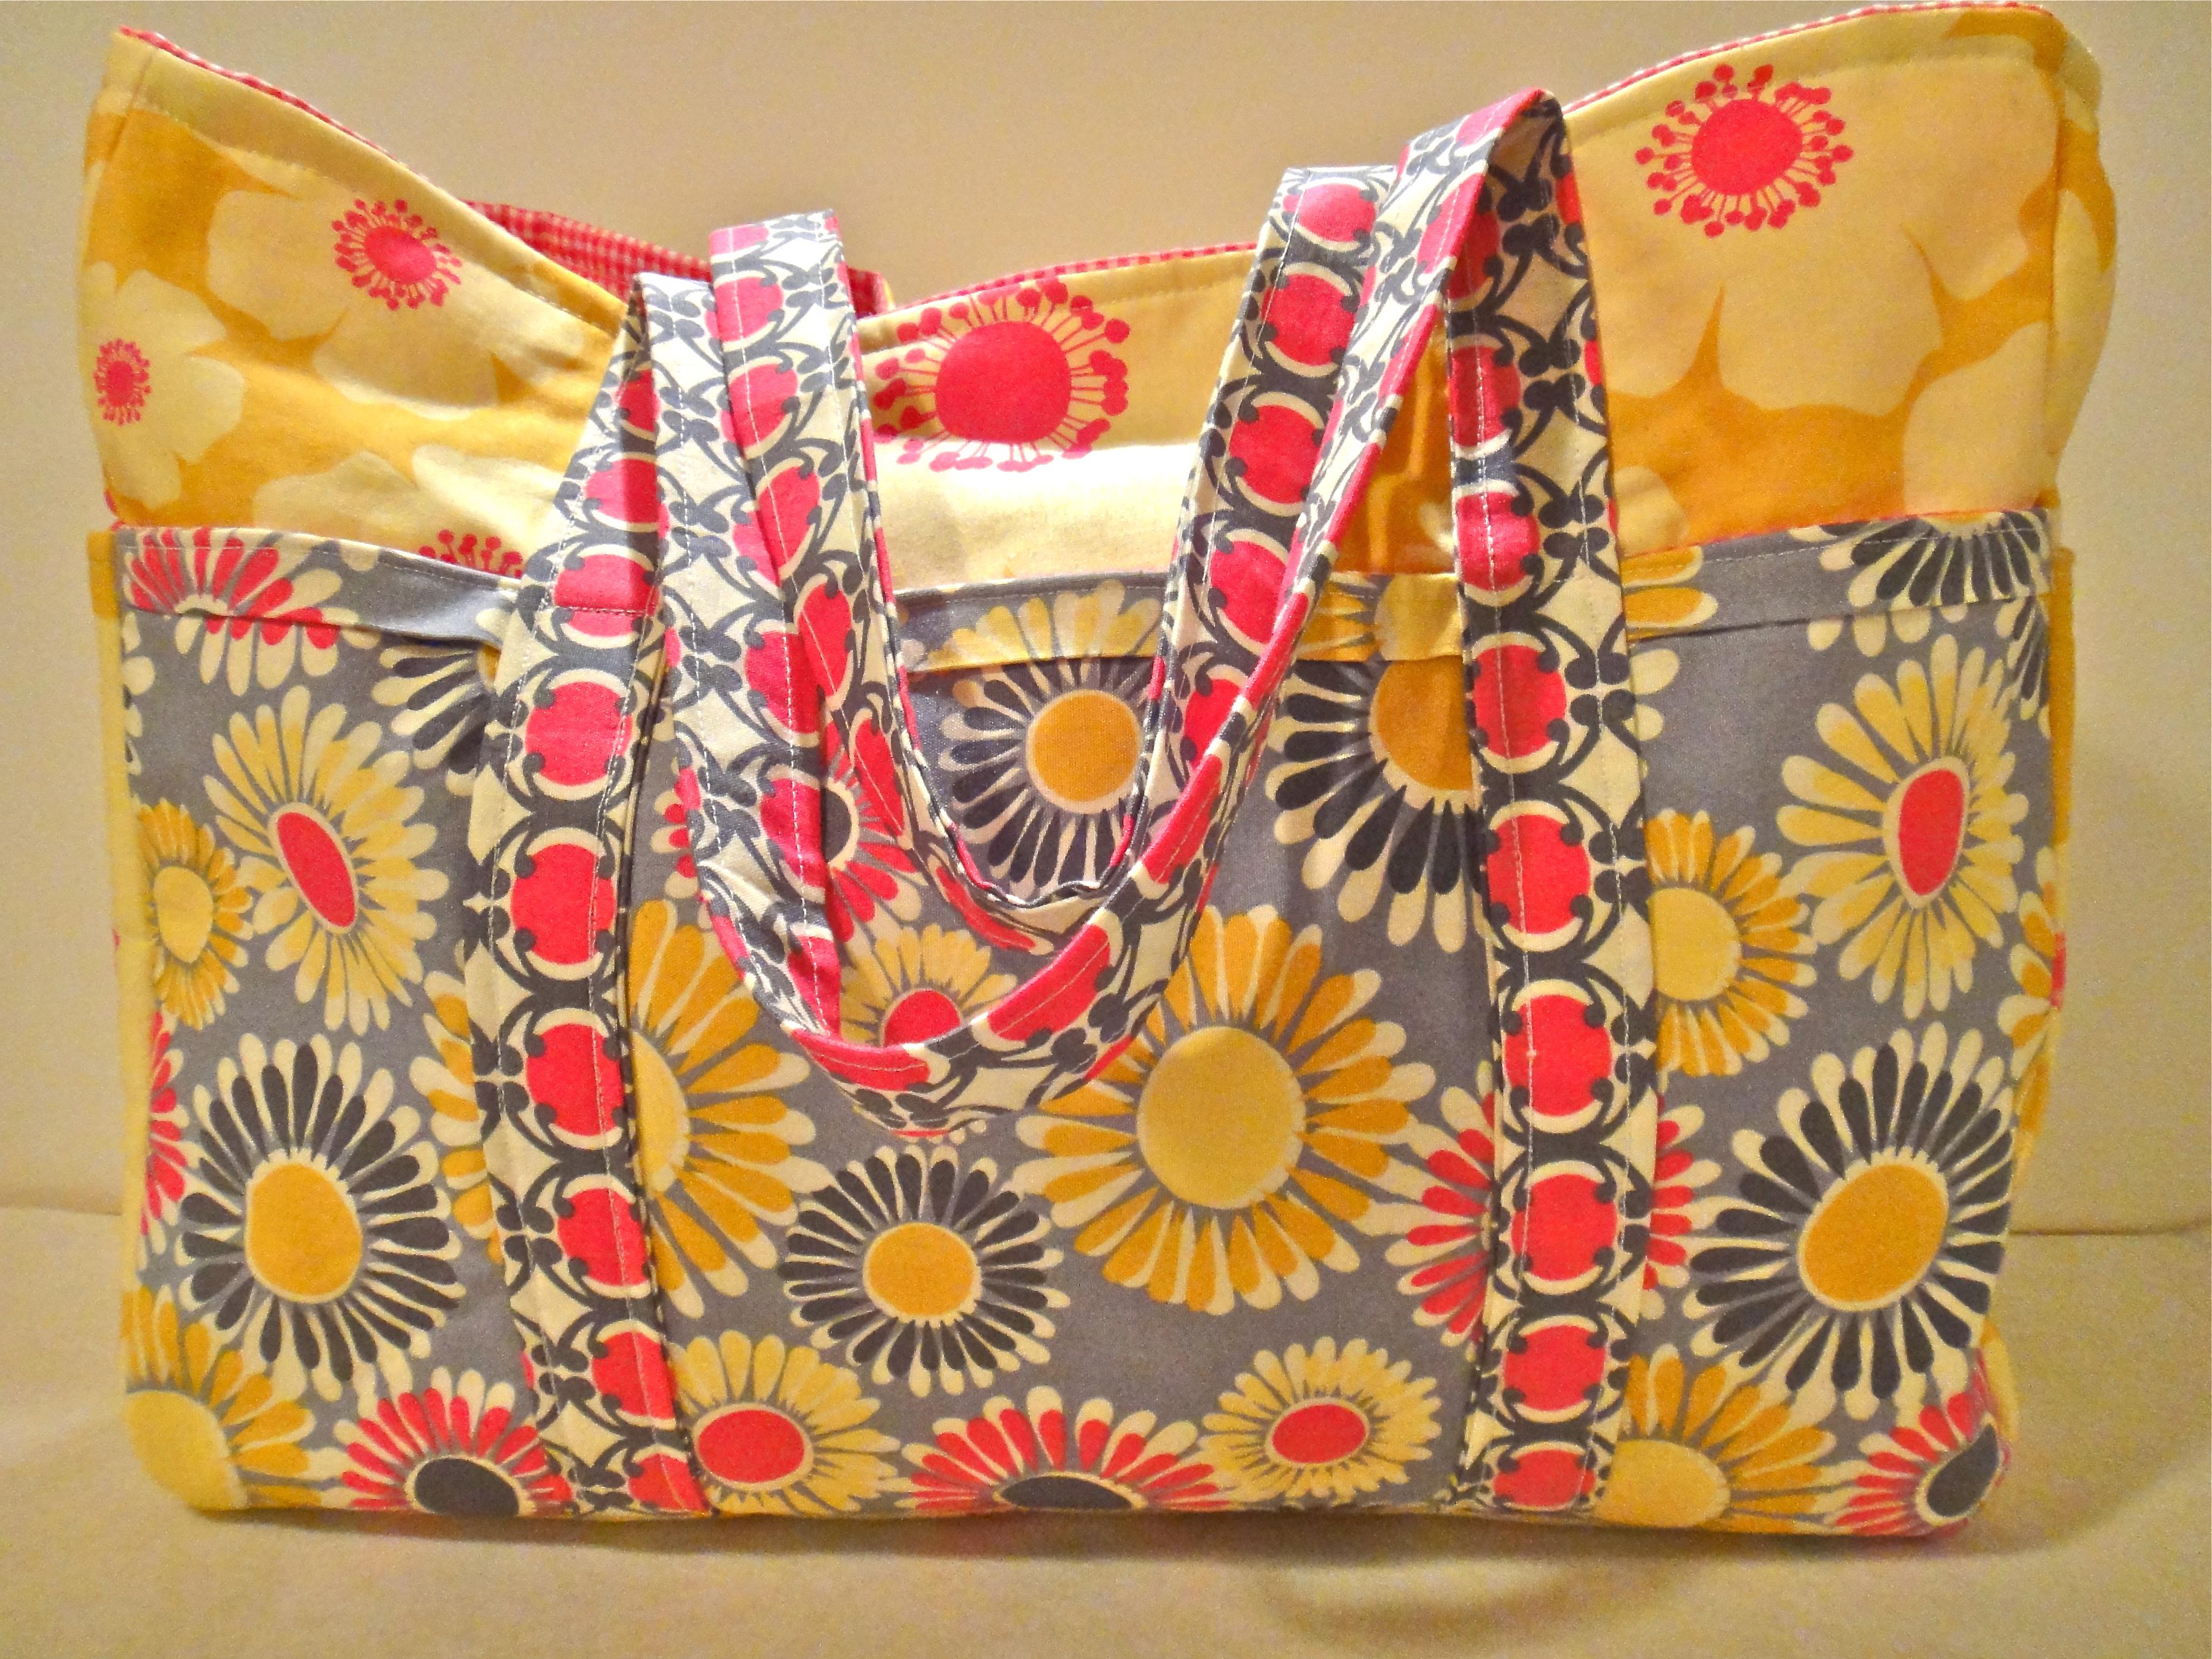 Free Crochet Baby Bag Patterns